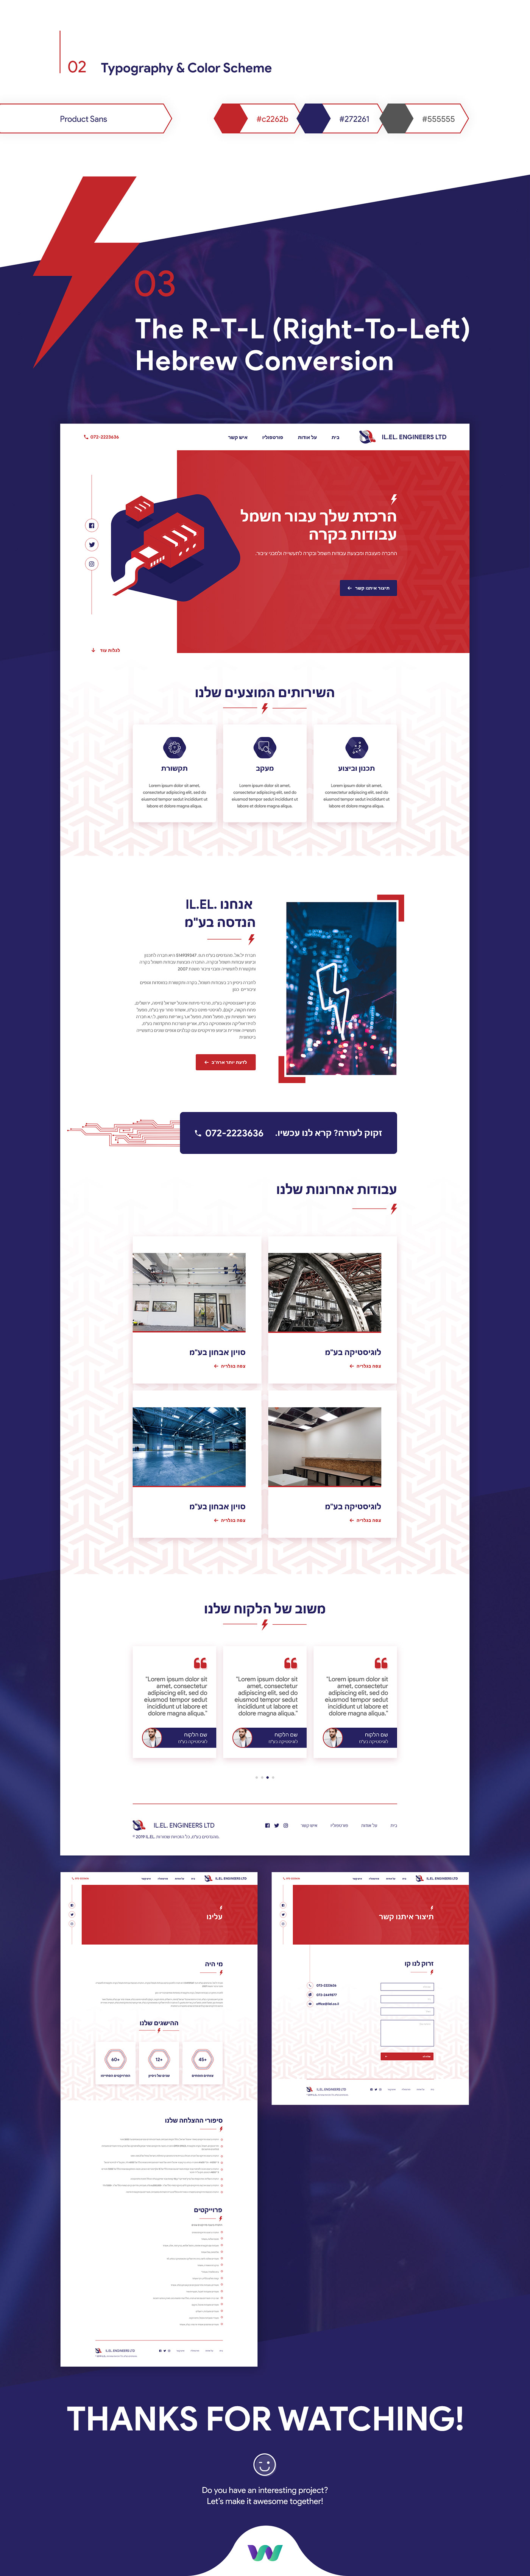 Web Webdesign webui UI ux UserInterface userinteraction UserExperience wix Website